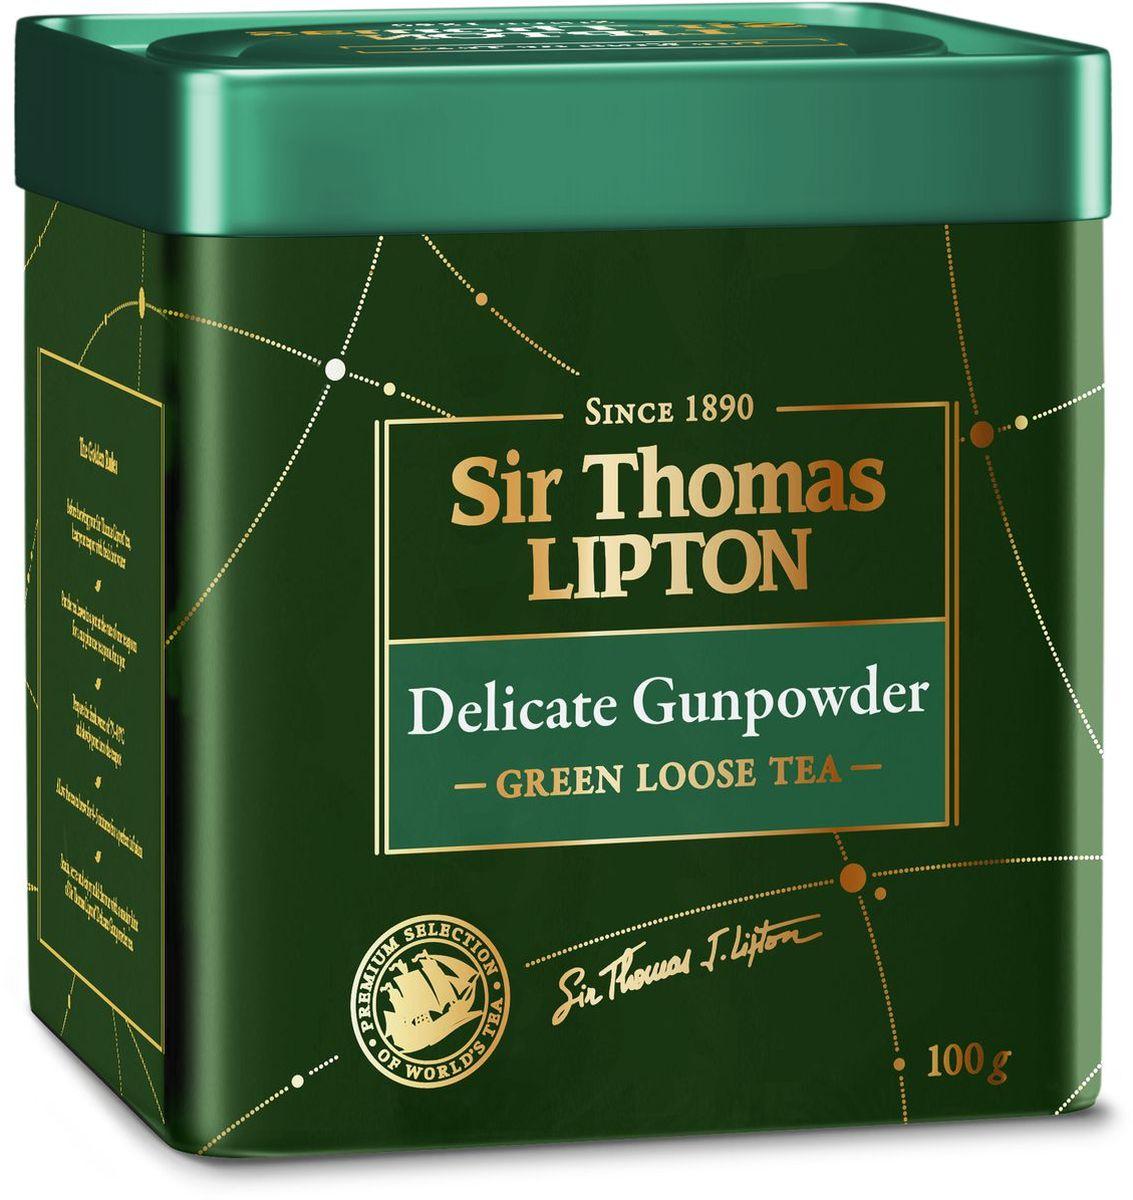 Sir Thomas Lipton Delicate Gunpowder чай зеленый листовой, 100 г greenfield чай greenfield классик брекфаст листовой черный 100г